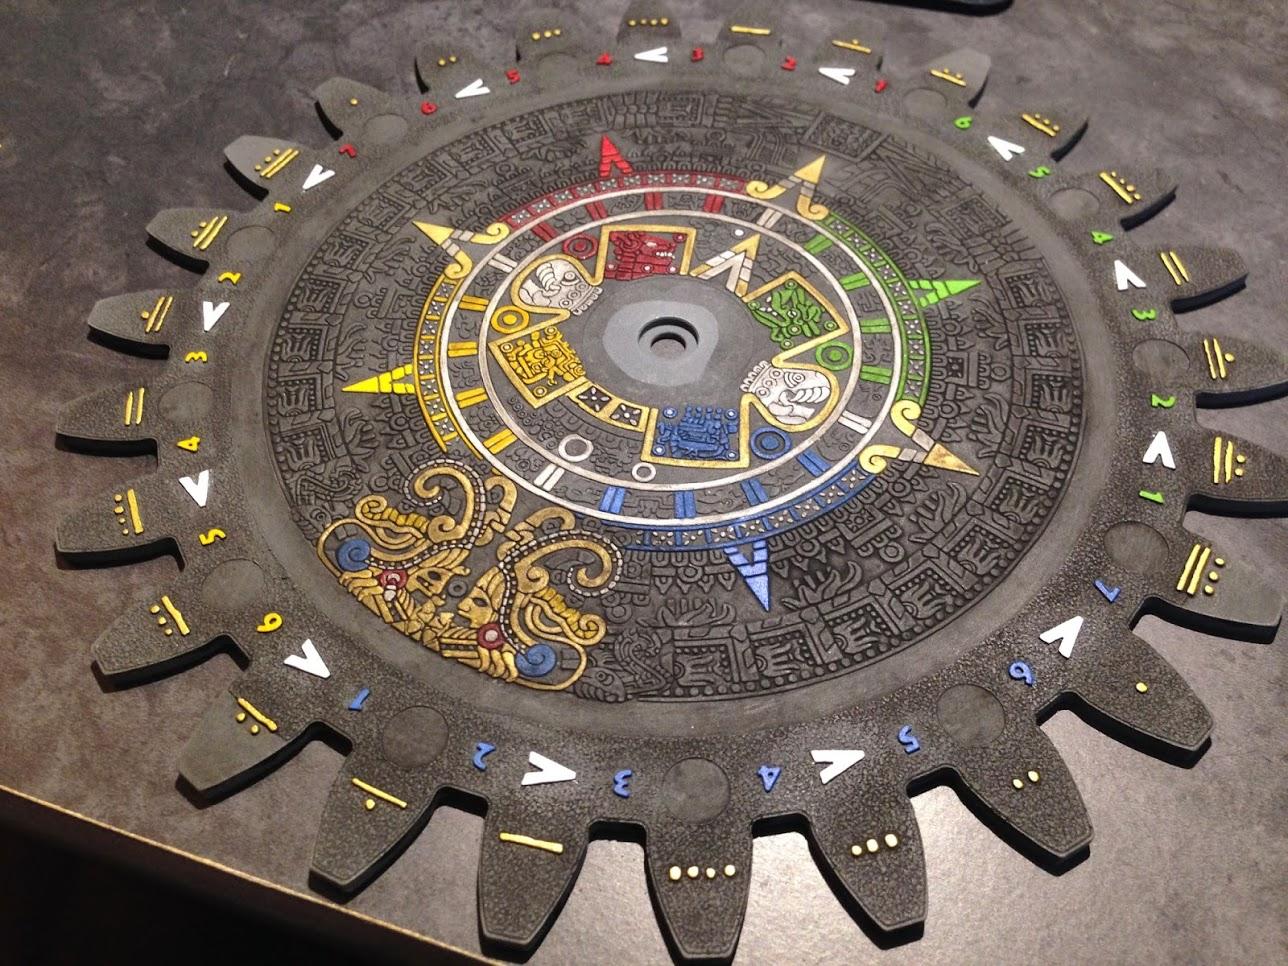 tzolkin-board-game-RWashburn-002.jpg